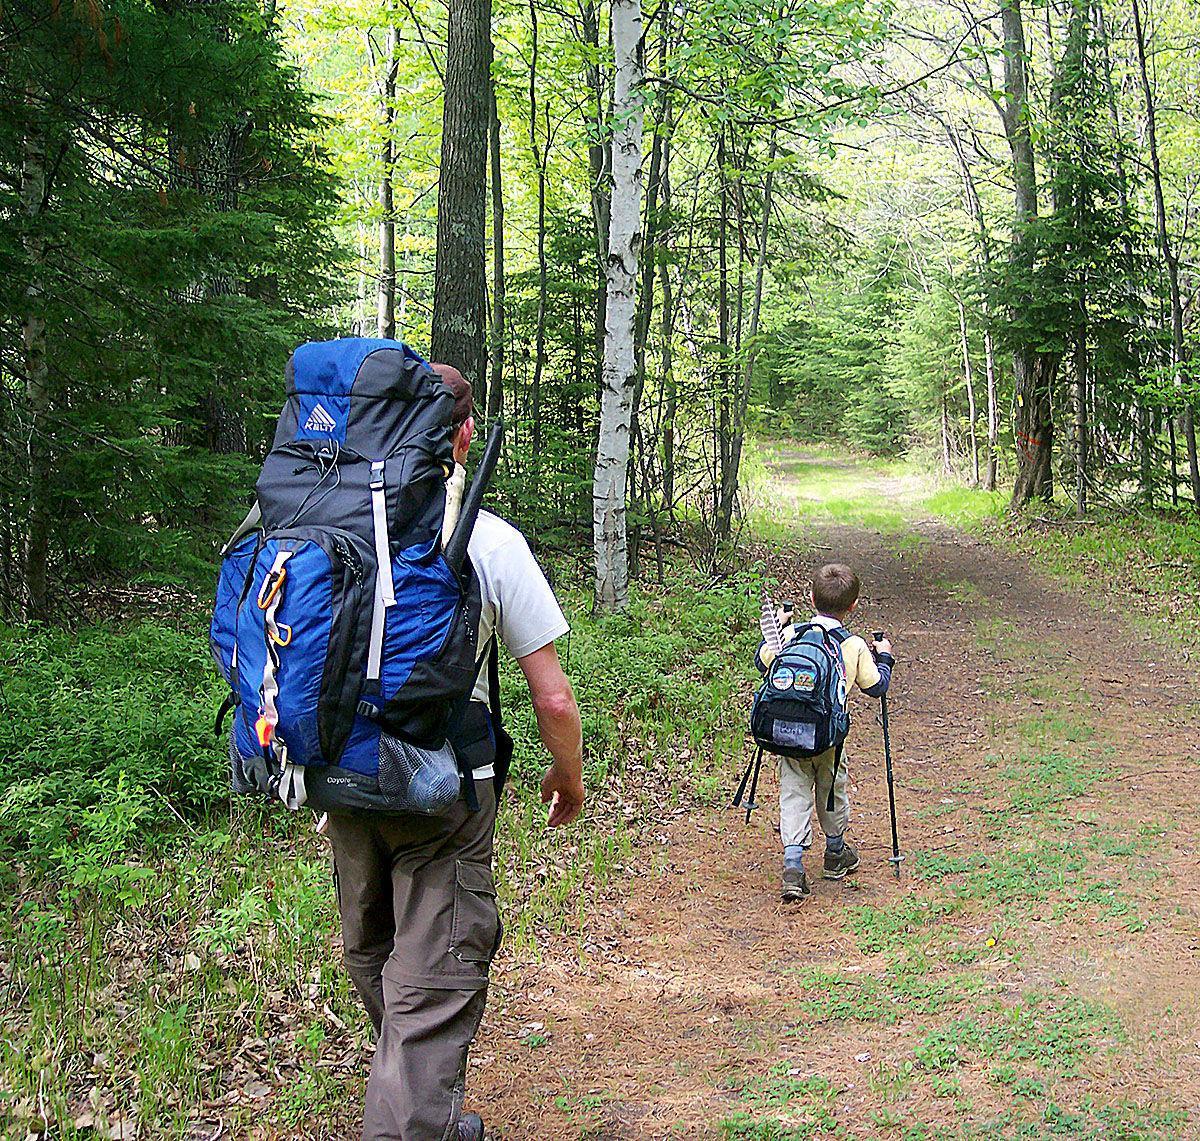 120218_con_offbeat_hiker_2